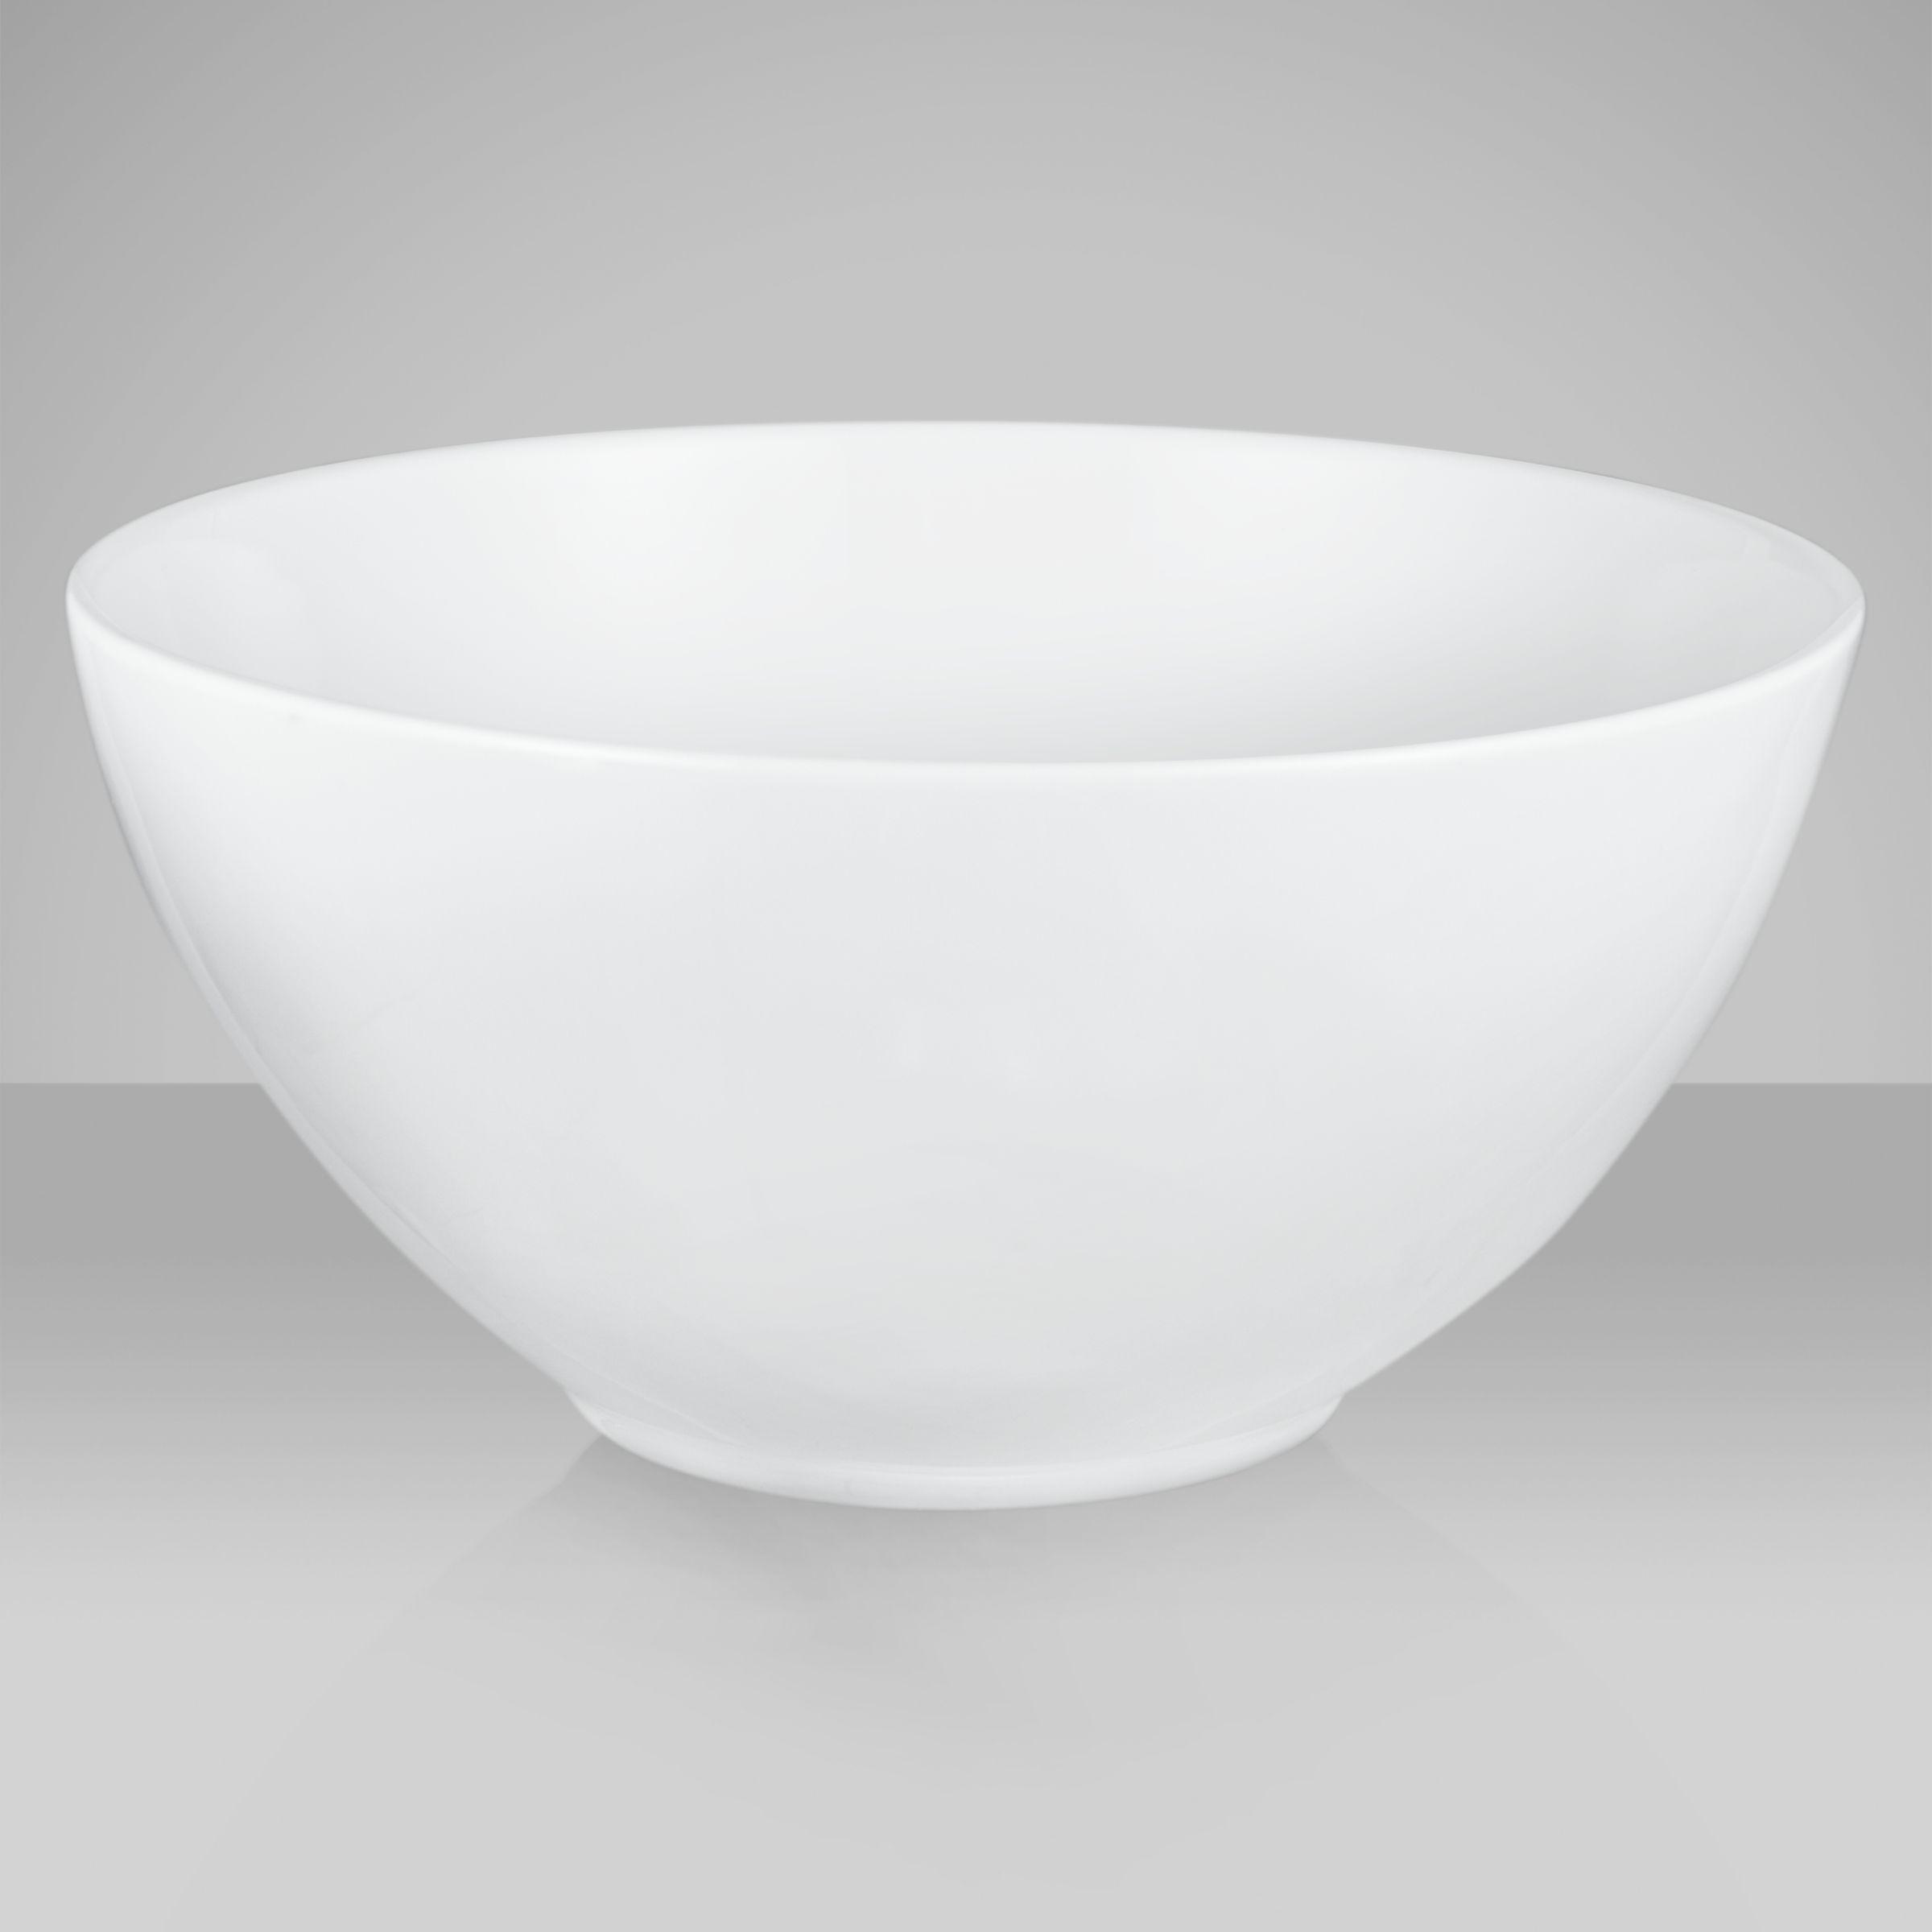 Jasper Conran Jasper Conran for Wedgwood White Collection Salad Bowl